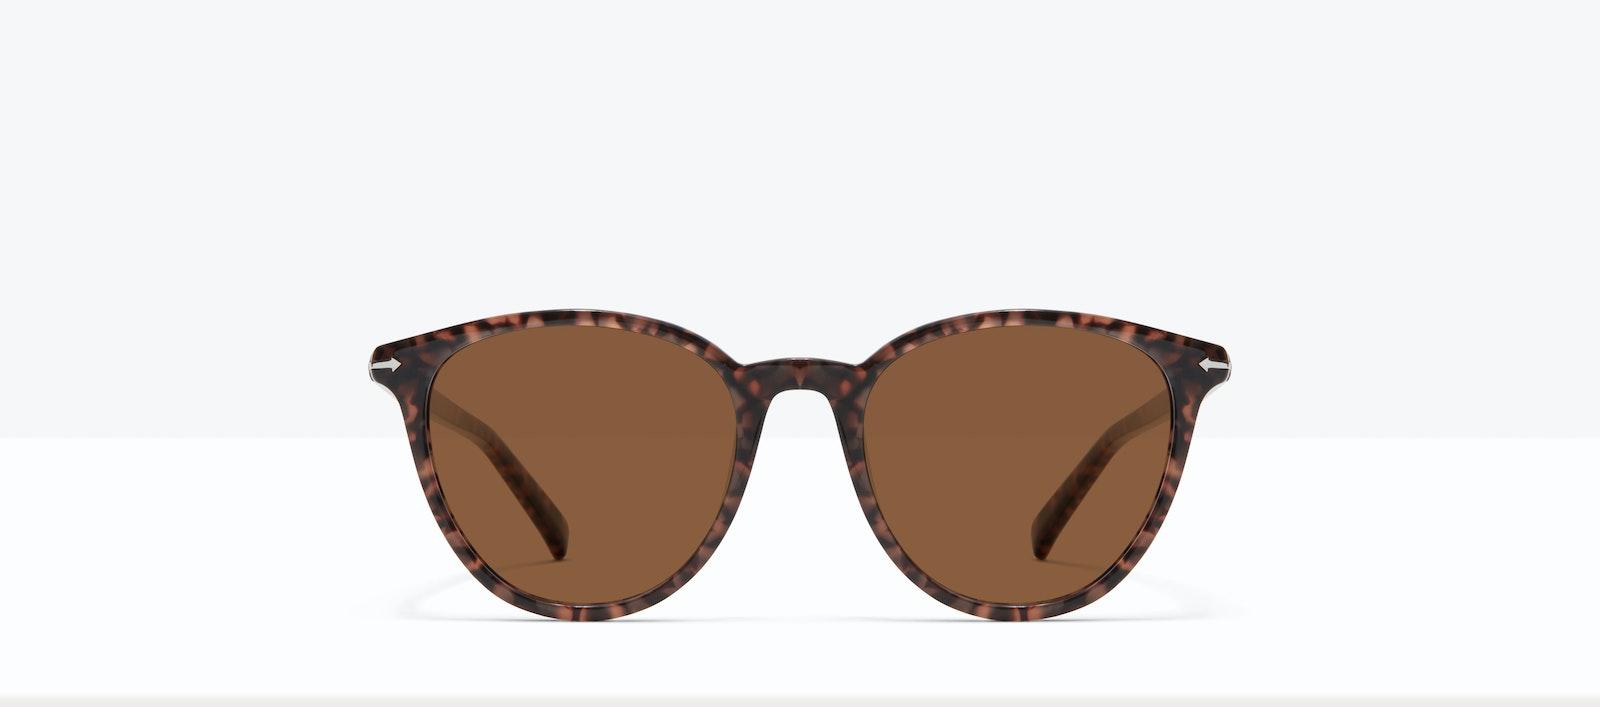 Affordable Fashion Glasses Round Sunglasses Women London Leo Front